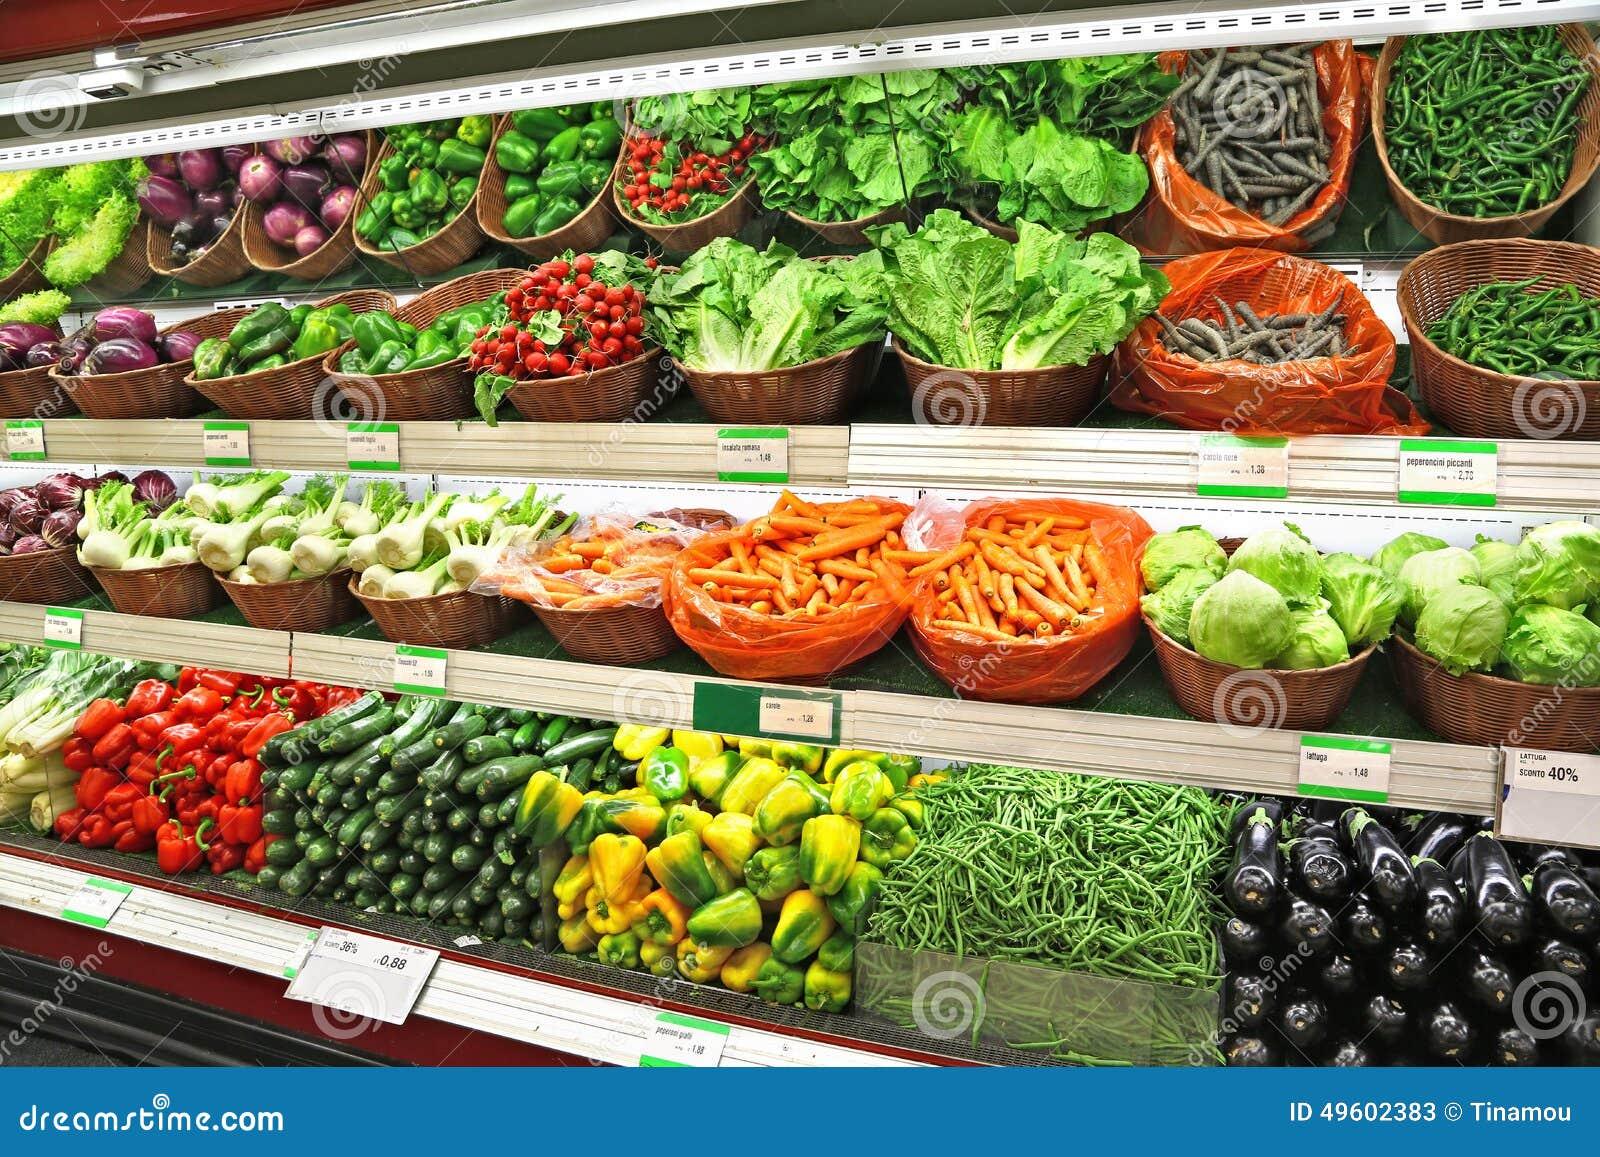 Vegetables on sale in a supermarket stock image image of for Milan food market